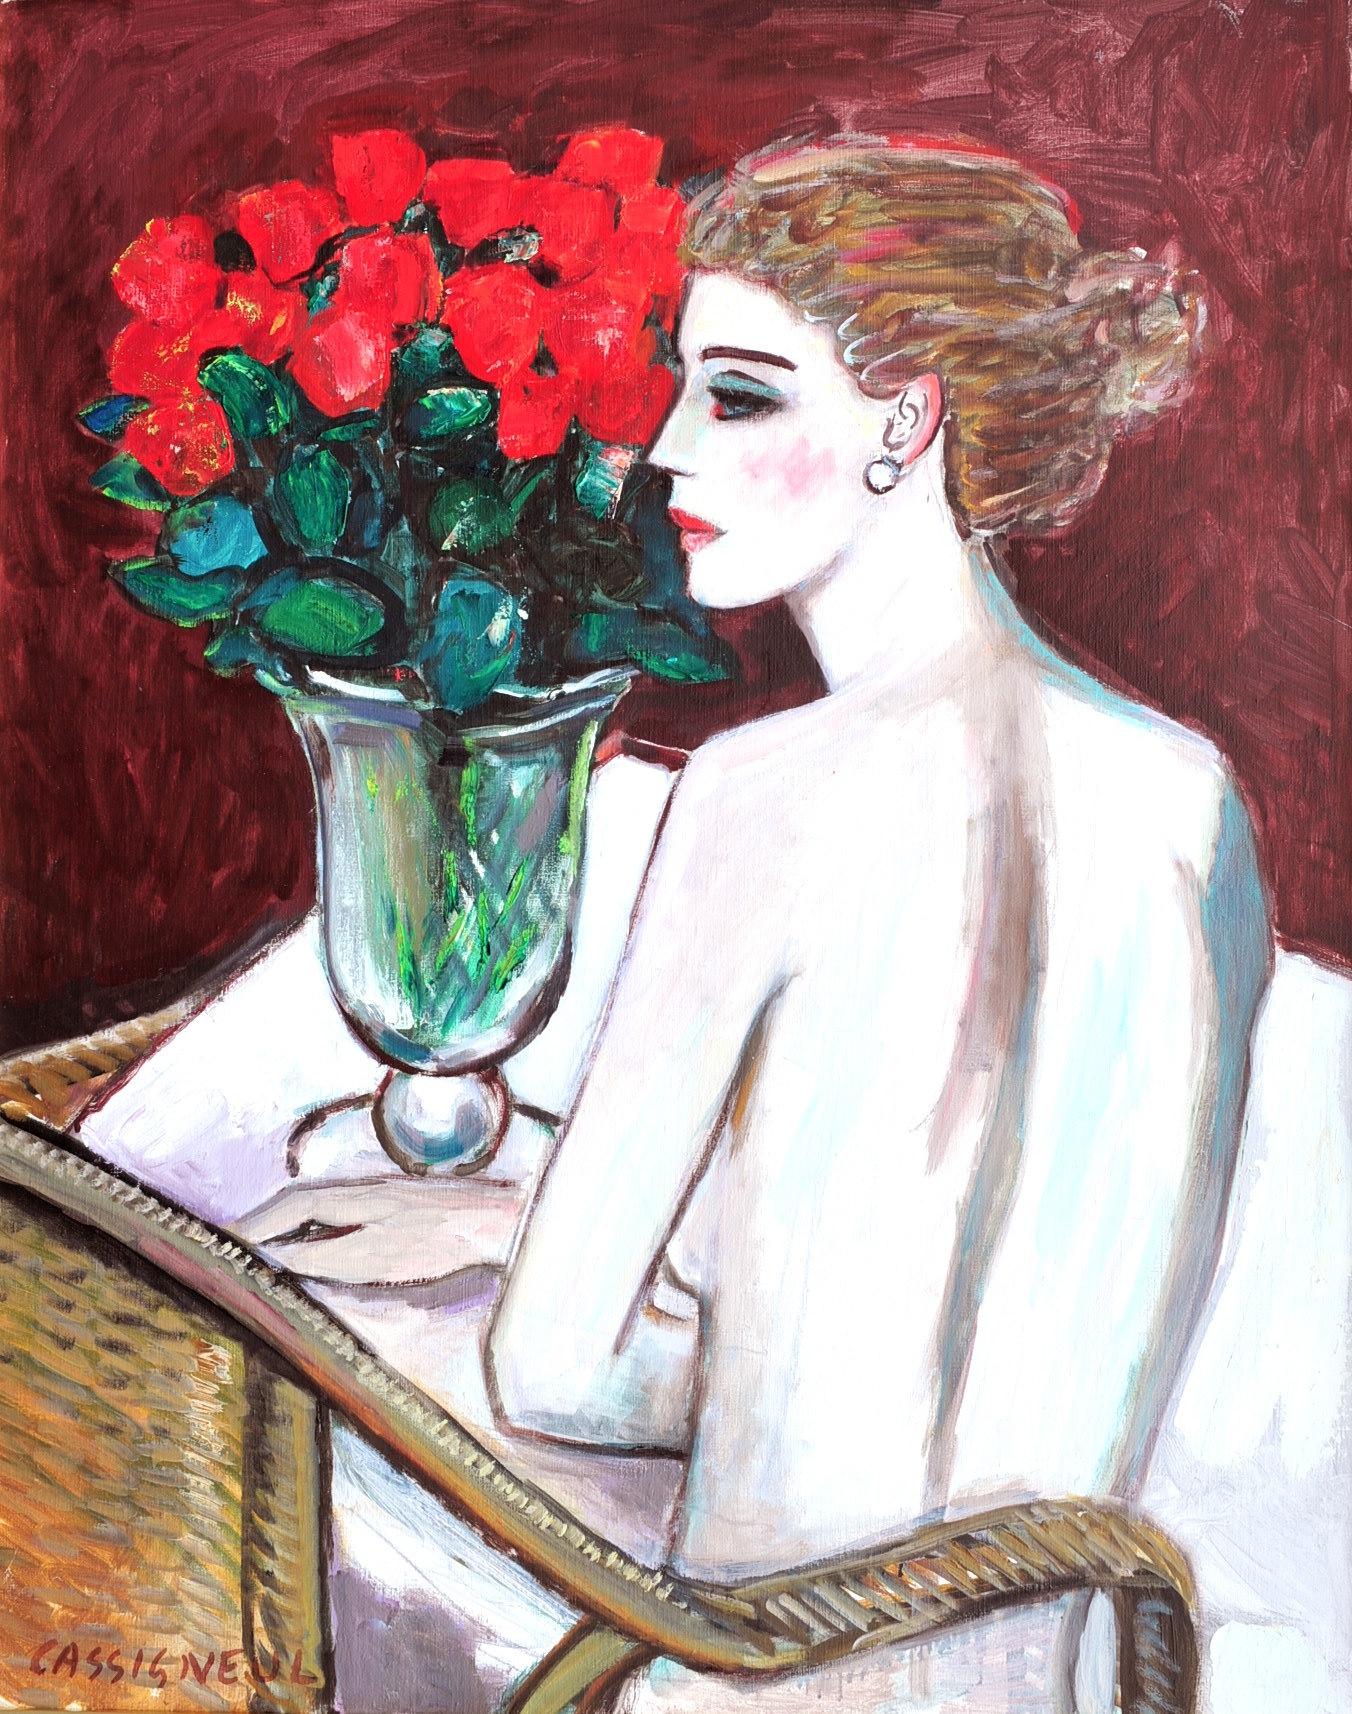 Jean-Pierre Cassigneul 1935- ,Les Roses sont arrivées au matin, Olie op Doek, 91,5 x 73 cm  gesign.linksonder gedateerd verso 1997.jpg